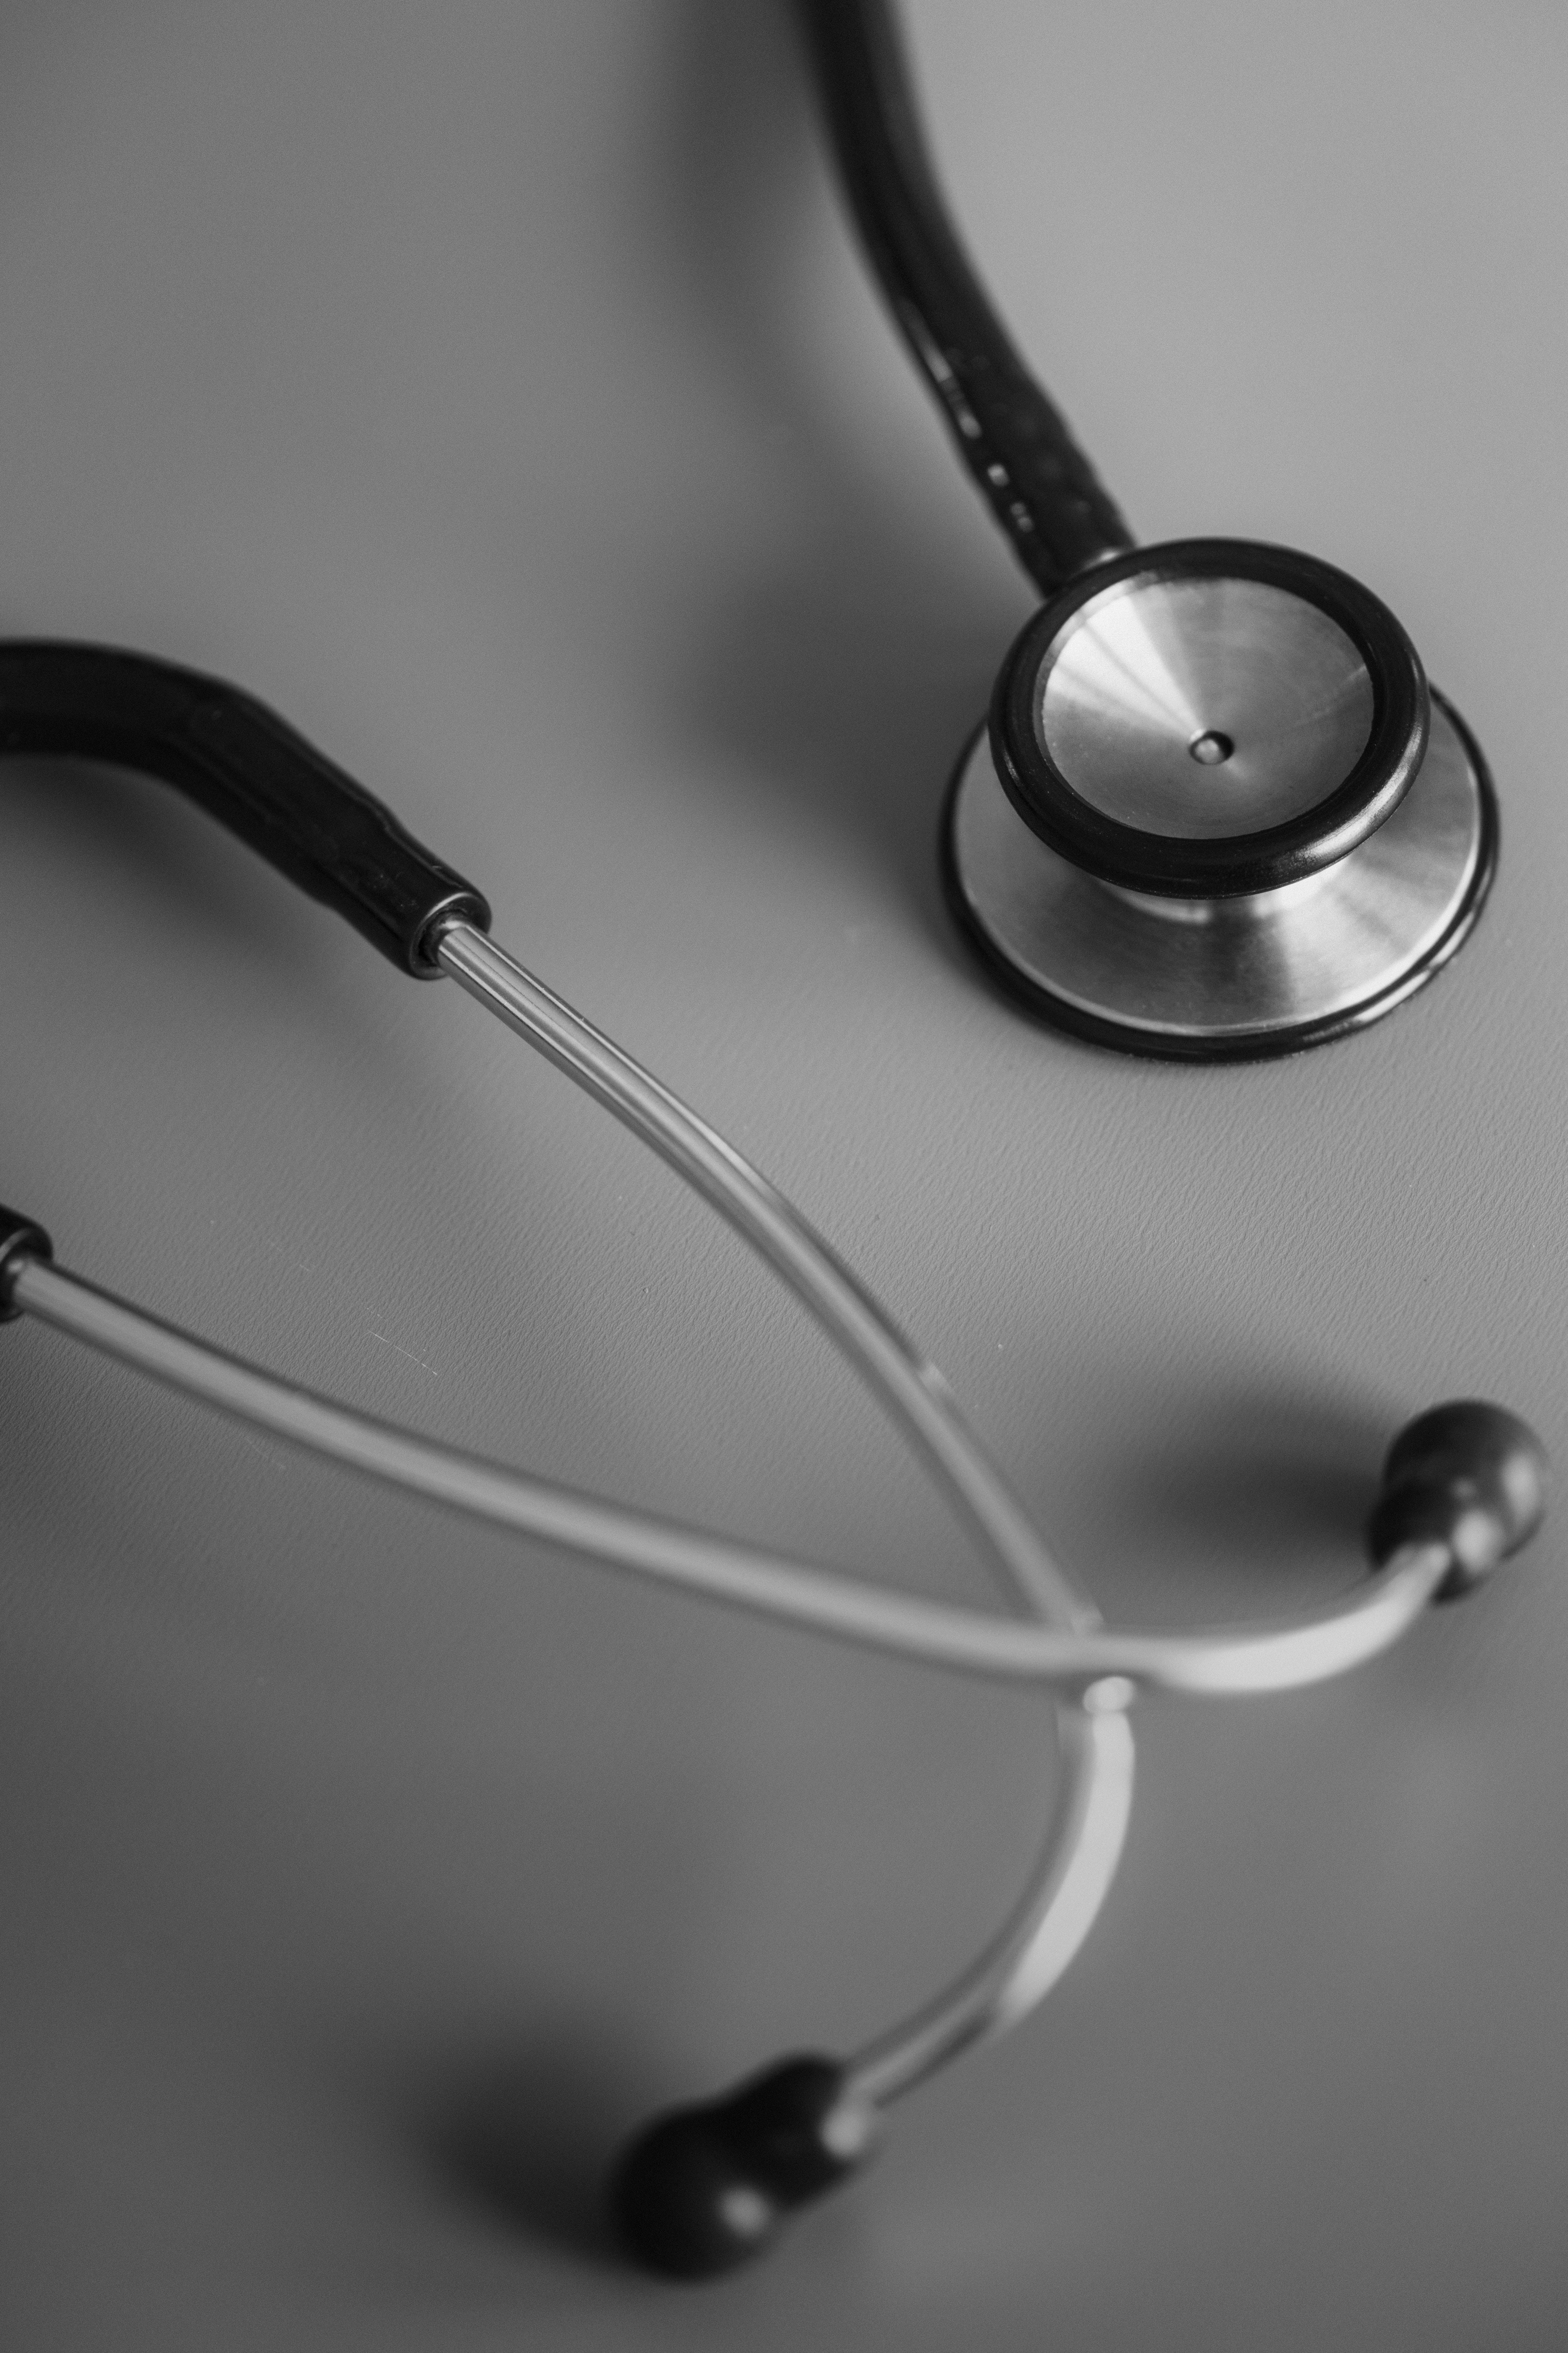 Stesthoscope